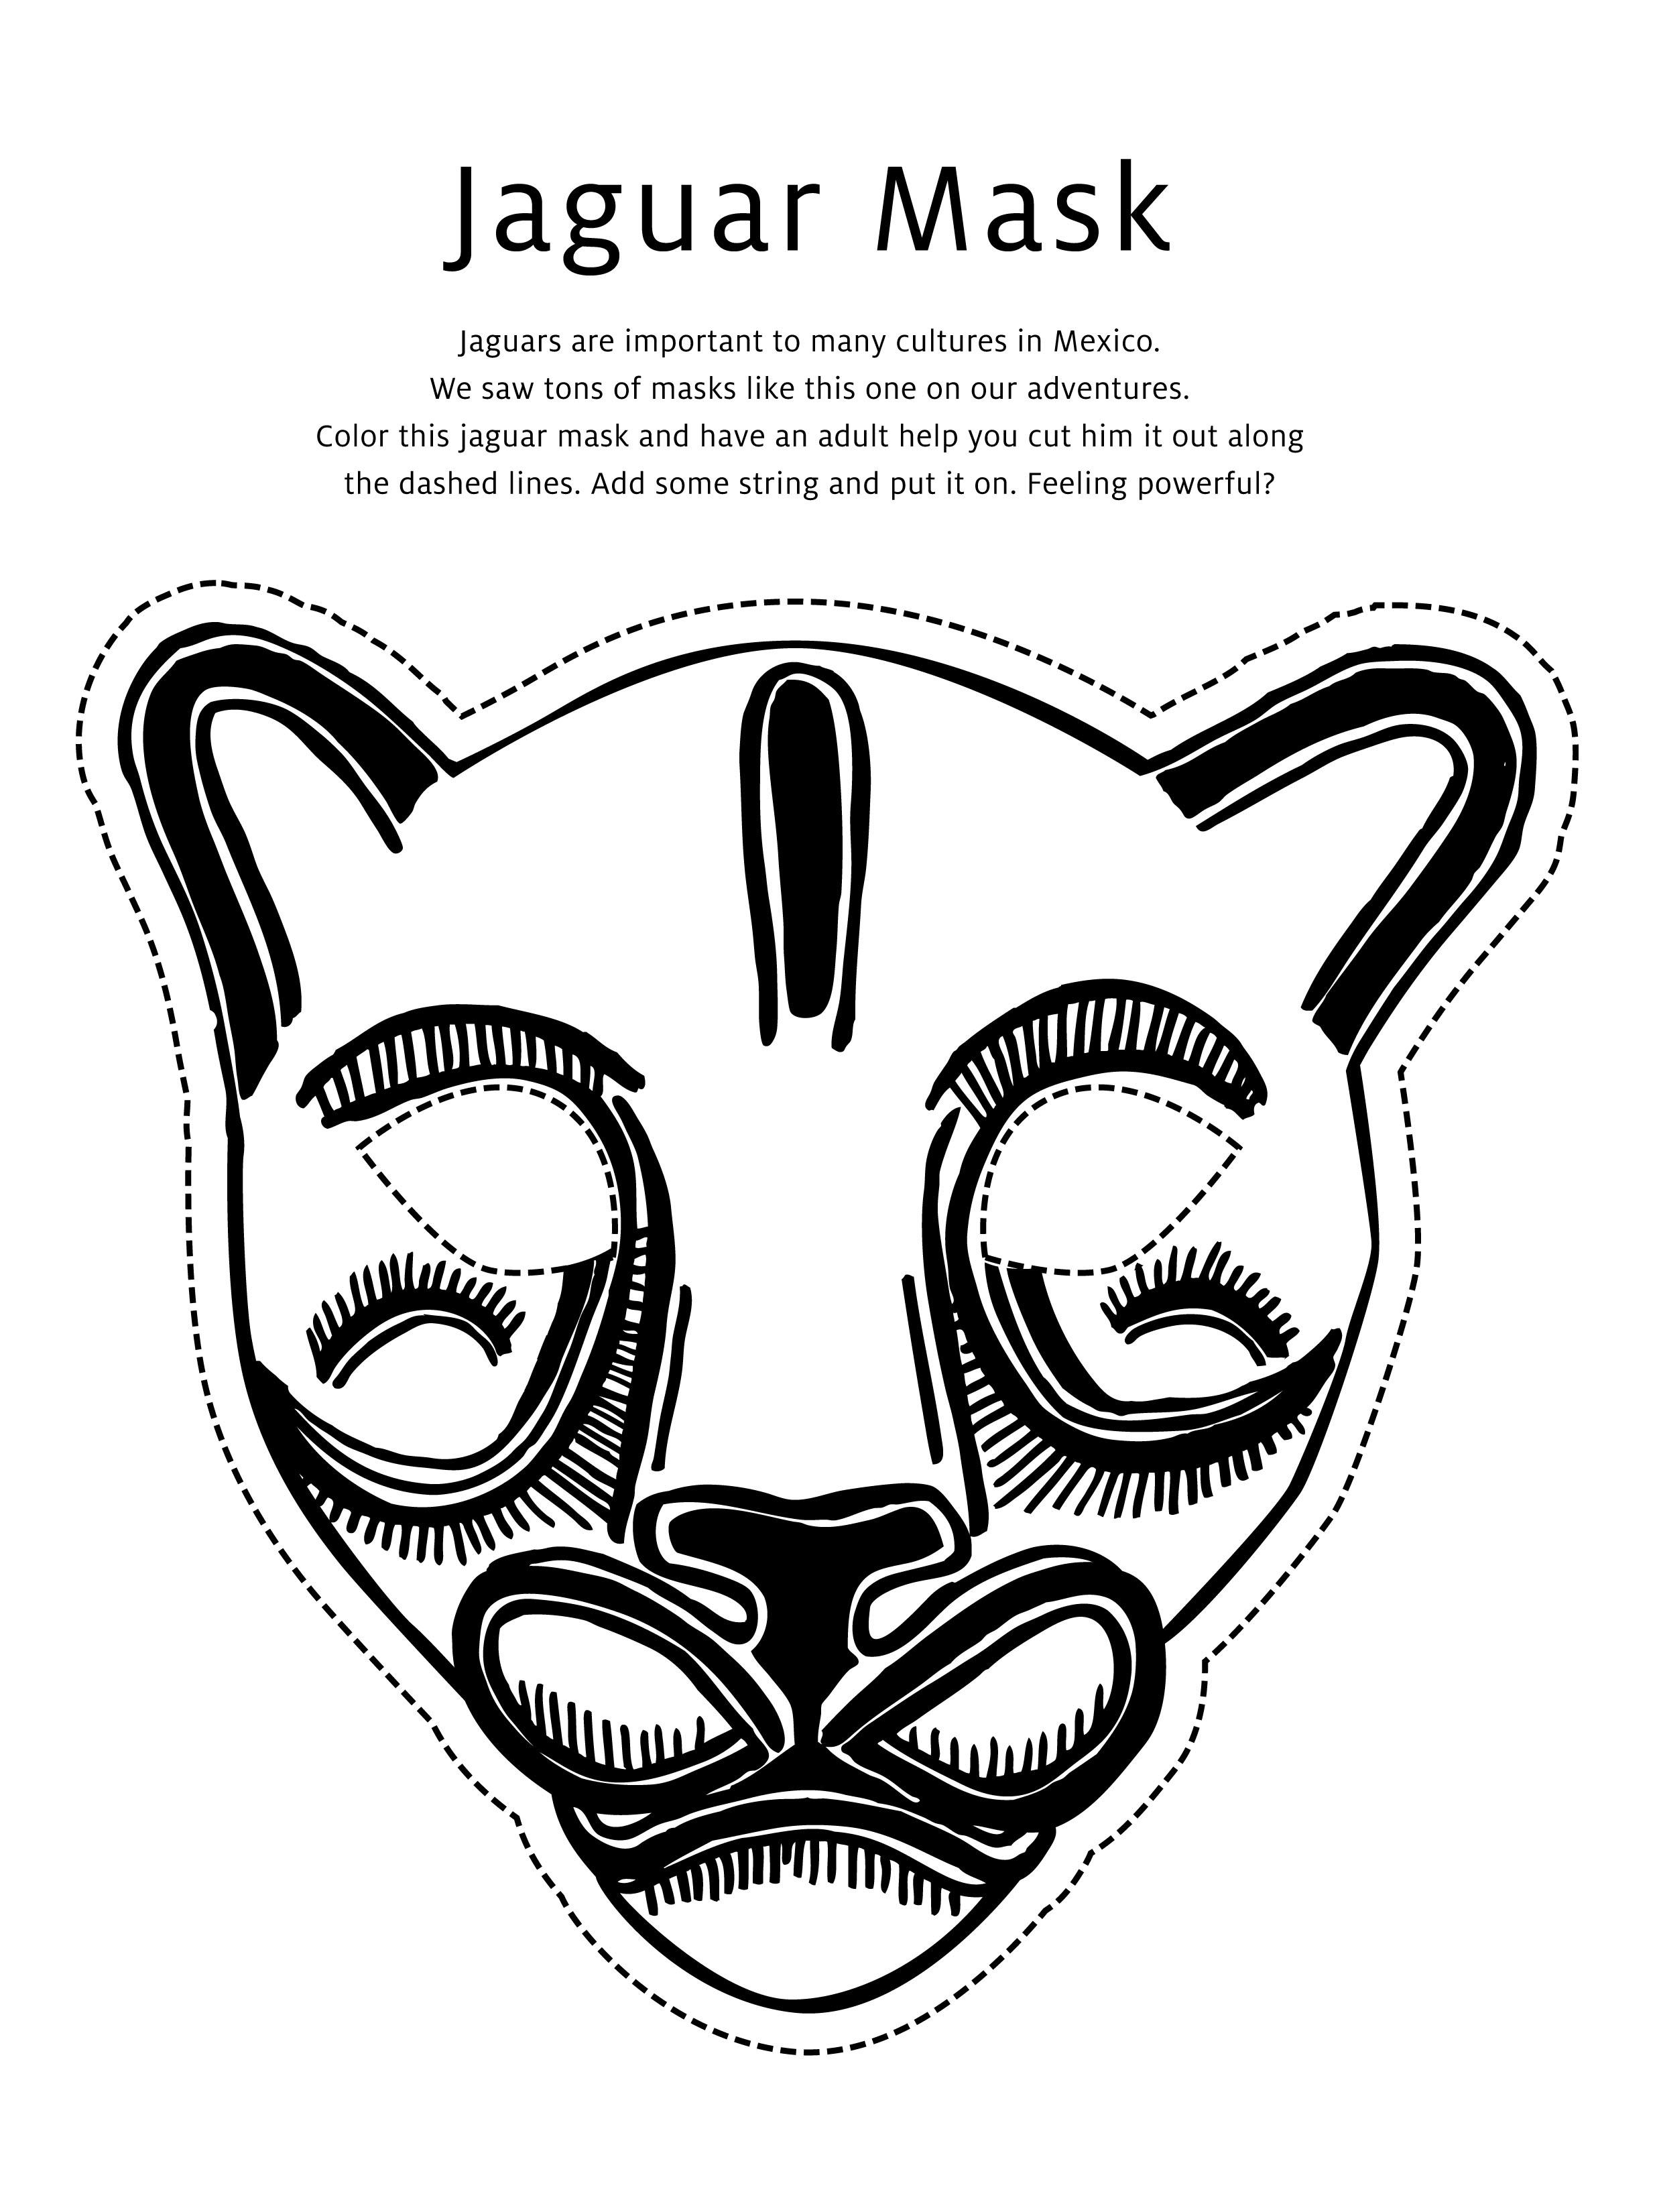 Coloring pages of jaguars printable - Jaguar Masks Colouring Pages 2469x3300